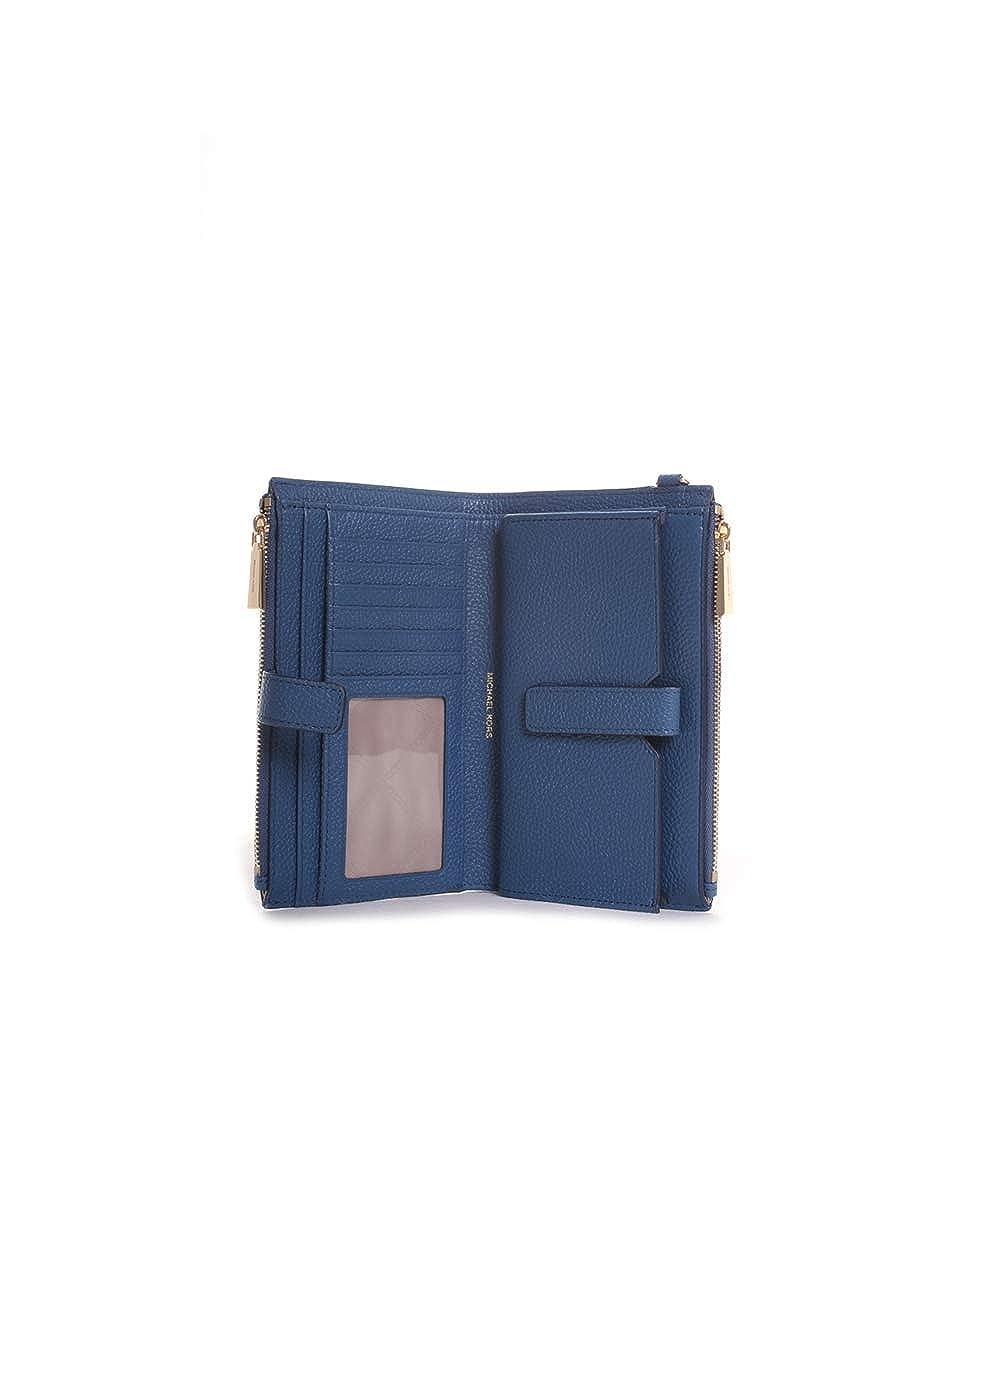 a9369b1de934 Amazon.com: Michael Kors Double Zip Leather Wristlet in Dark Chambray:  Clothing